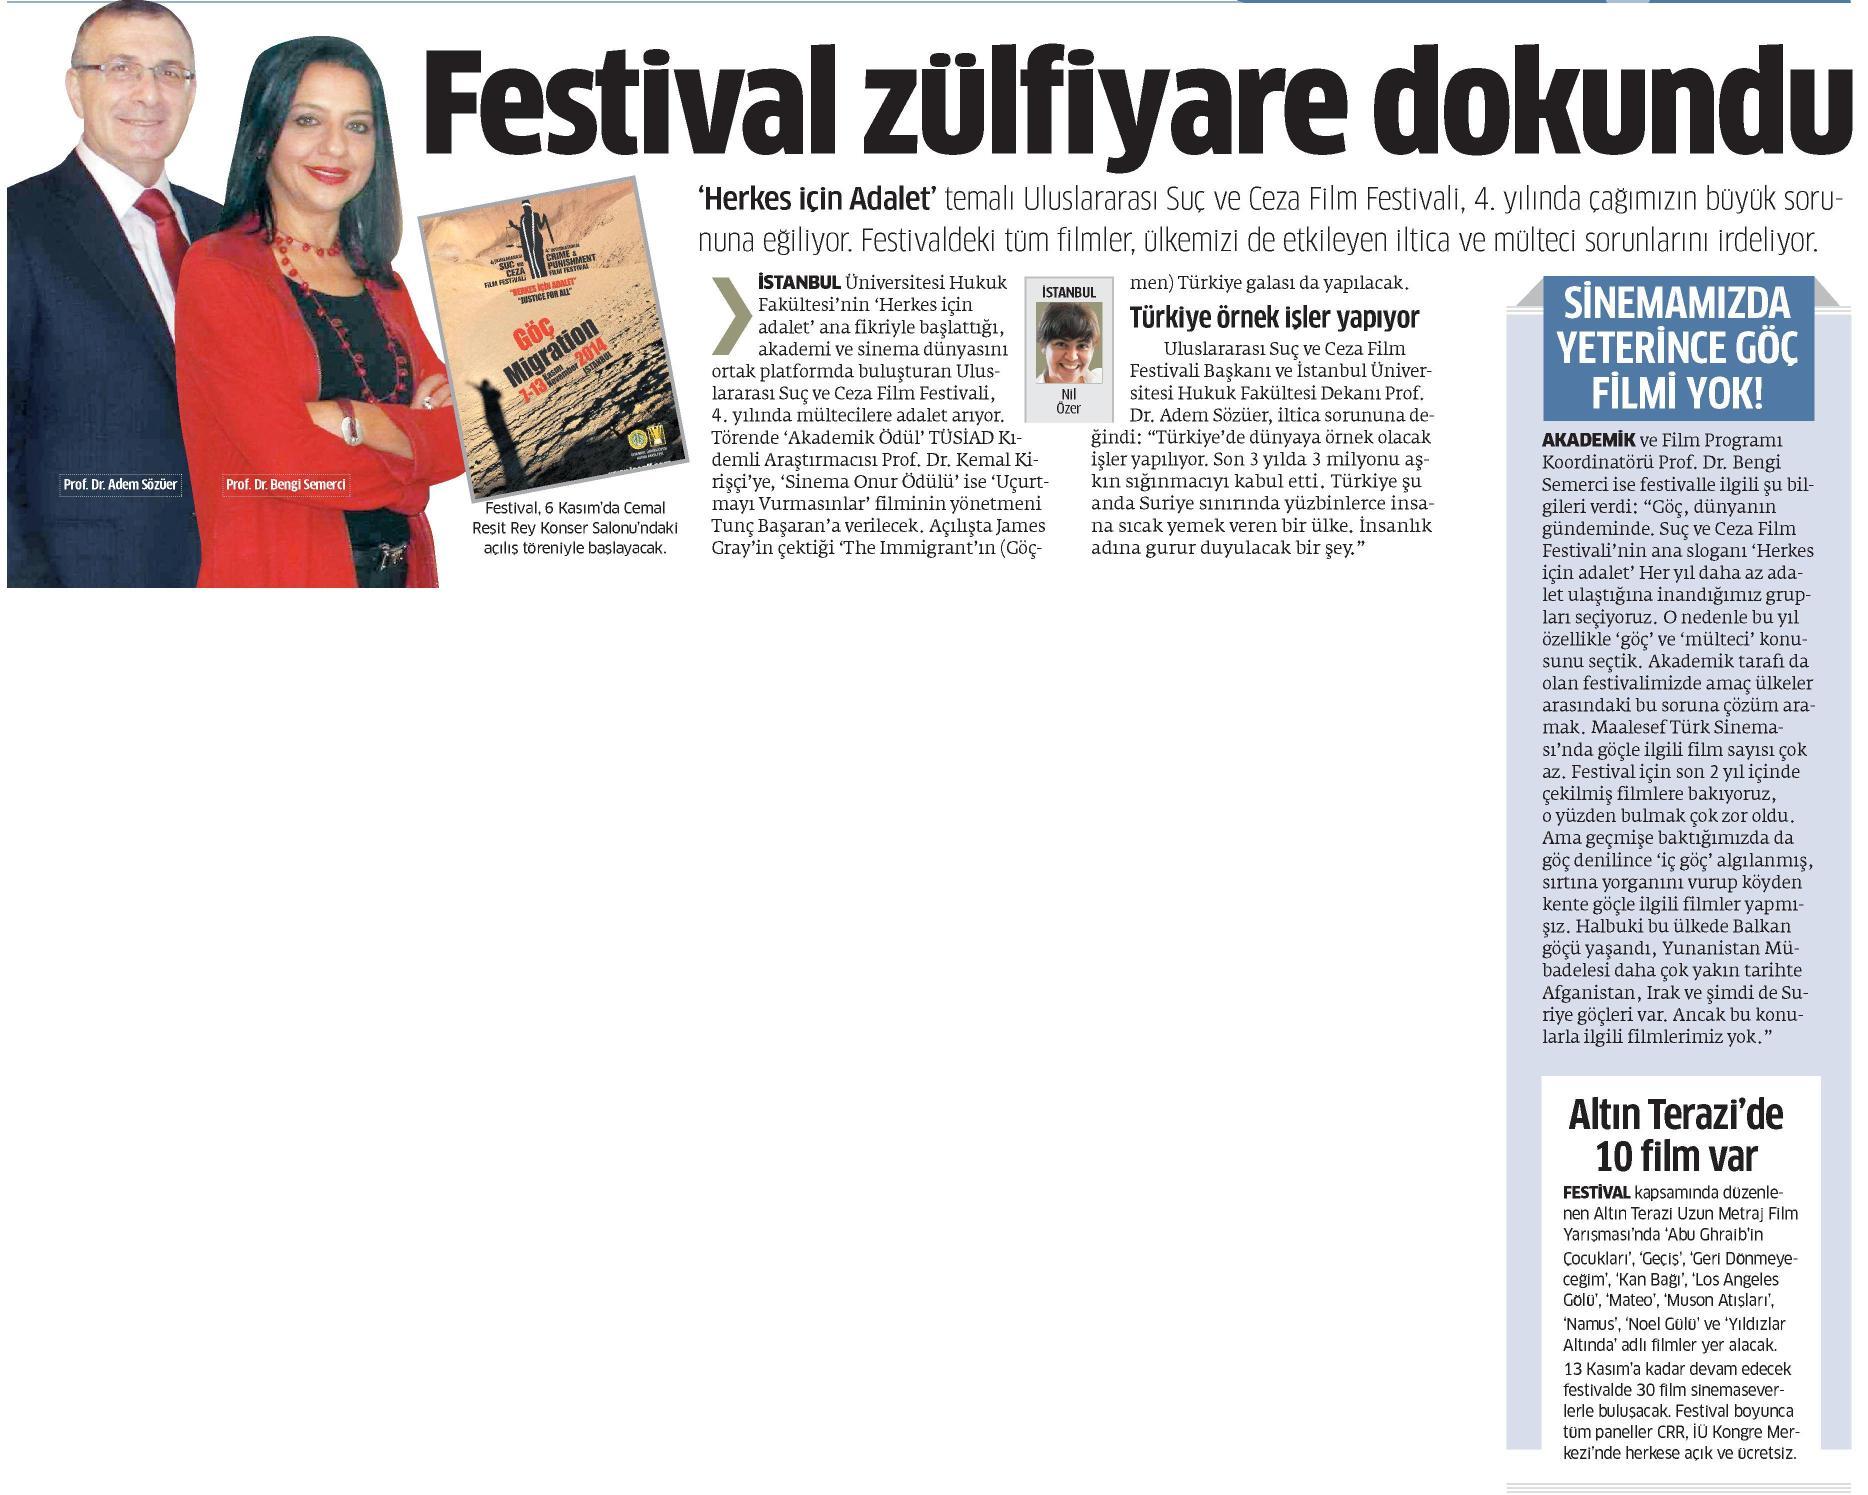 Festival zülfiyare dokundu - STAR  24.10.2014